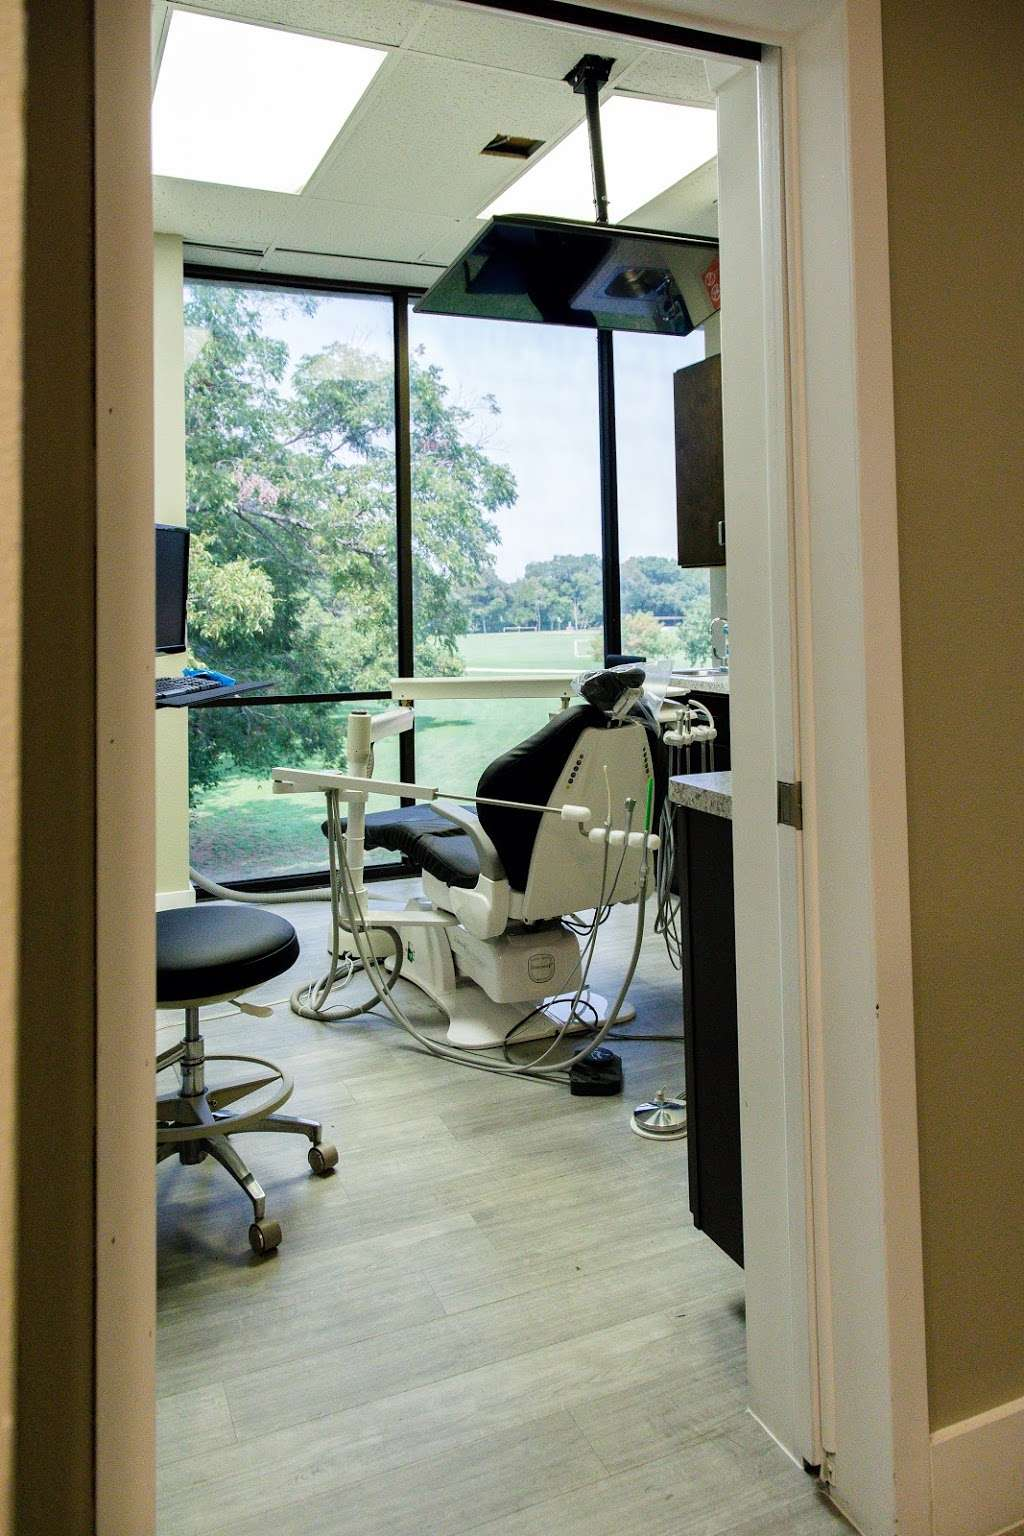 Royal Lane Dental Center - dentist  | Photo 3 of 8 | Address: 8499 Greenville Ave #210, Dallas, TX 75231, USA | Phone: (469) 904-2080